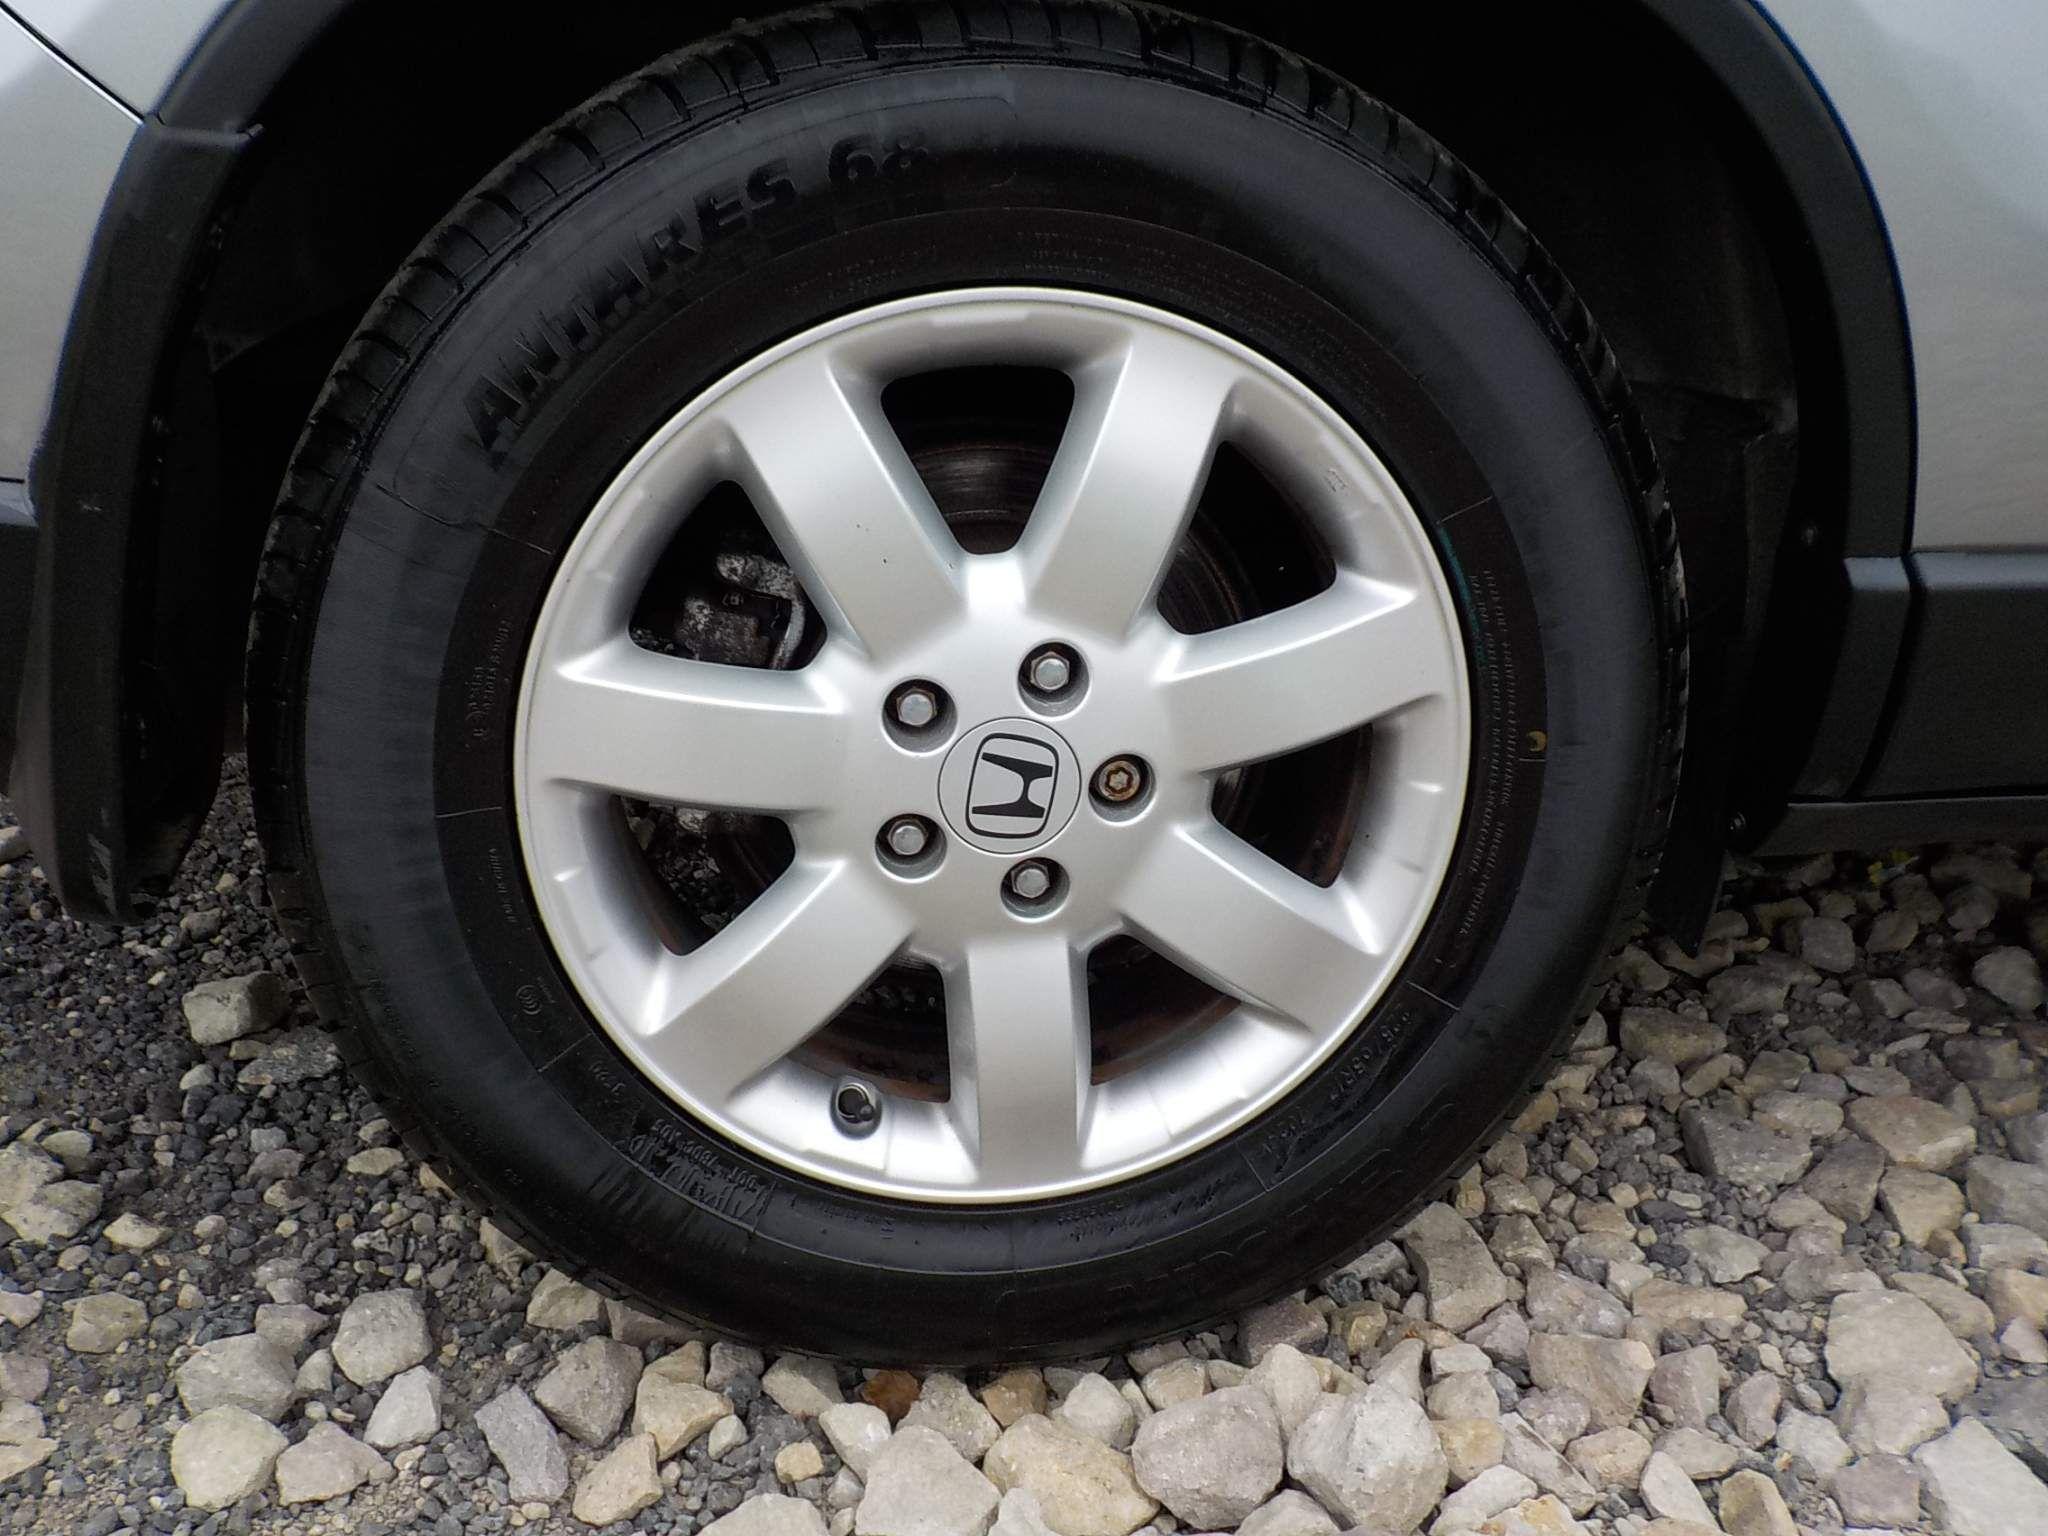 Honda CR-V 2.2 i-CDTi ES 5dr